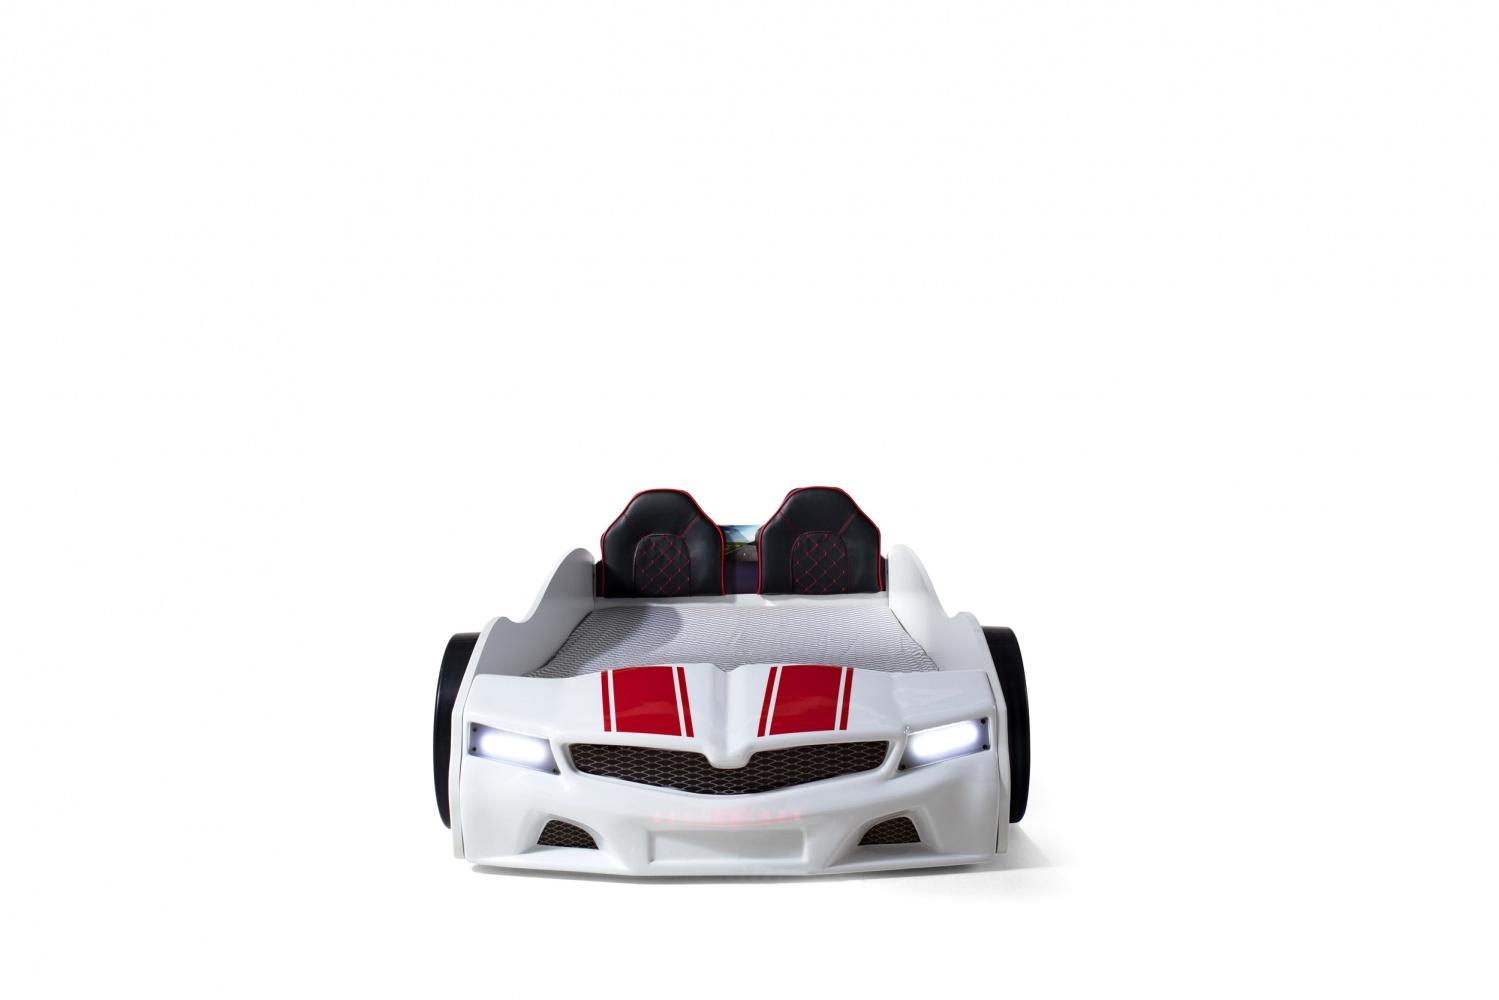 Autobettzimmer Komplett SPX Turbo 4-teilig Weiß